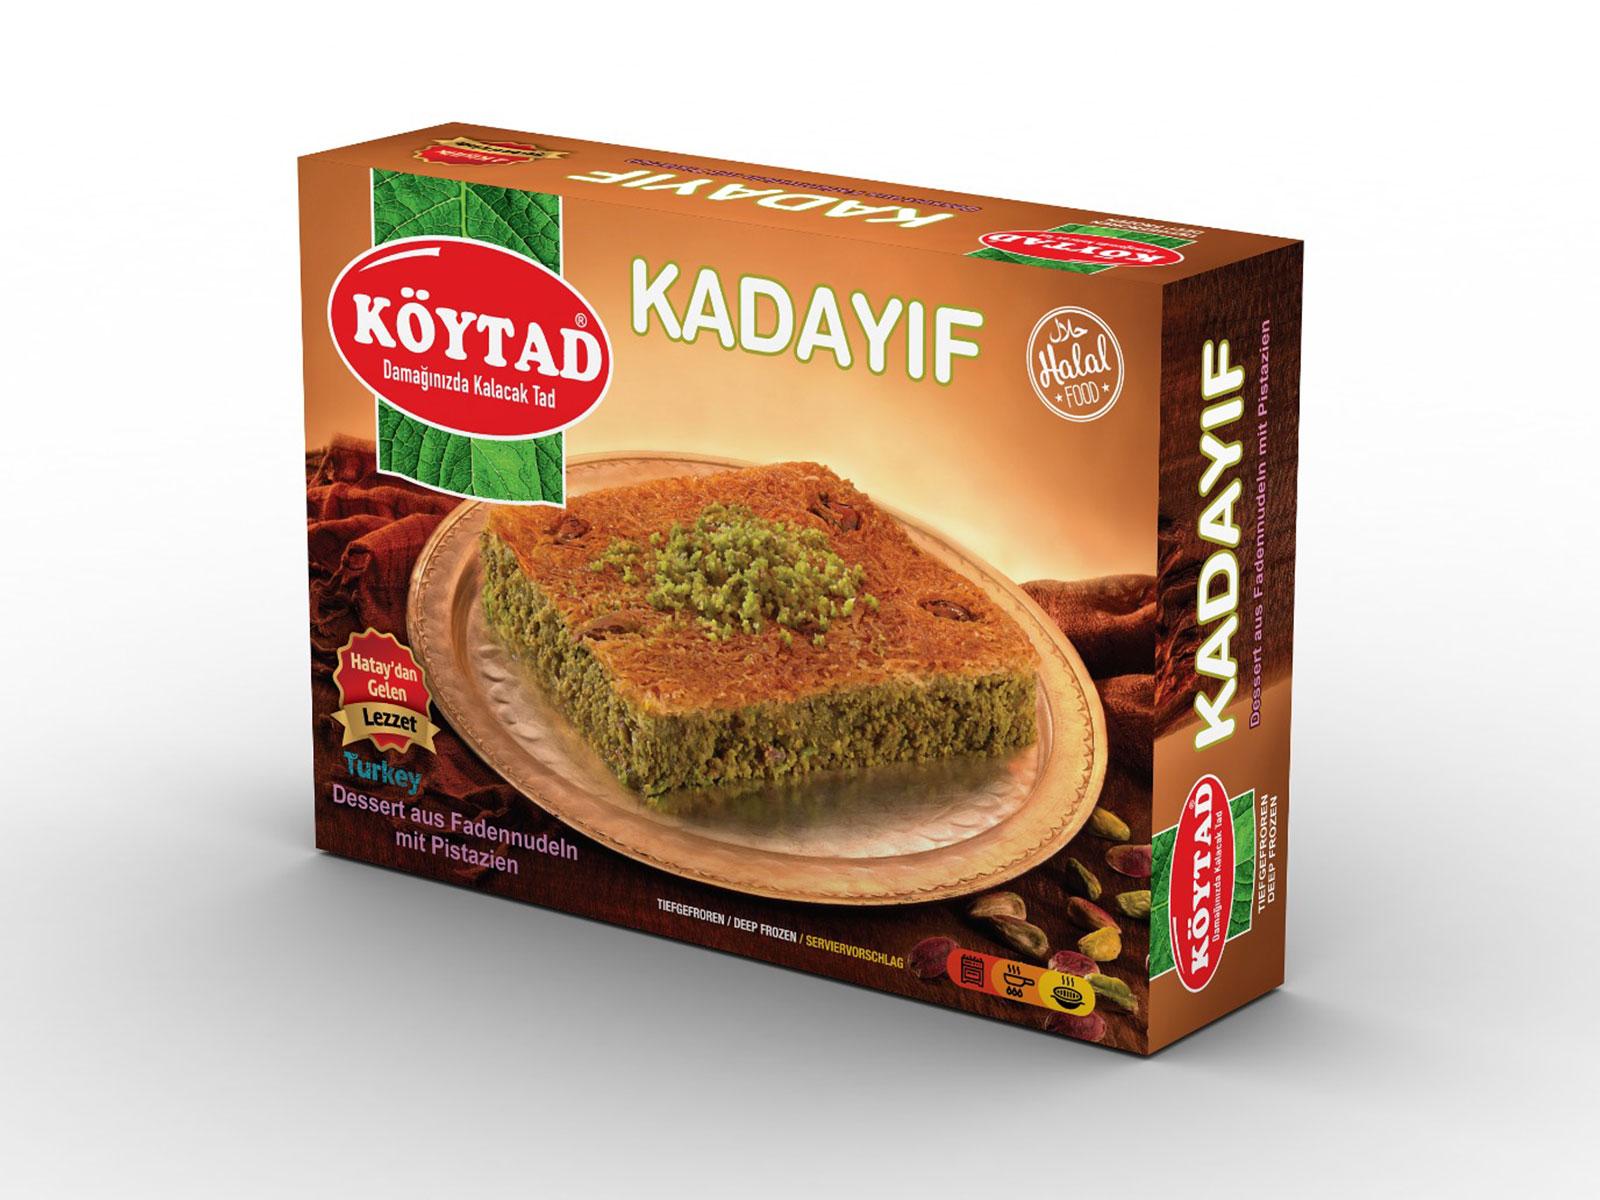 Kadayif-Koytad-3D